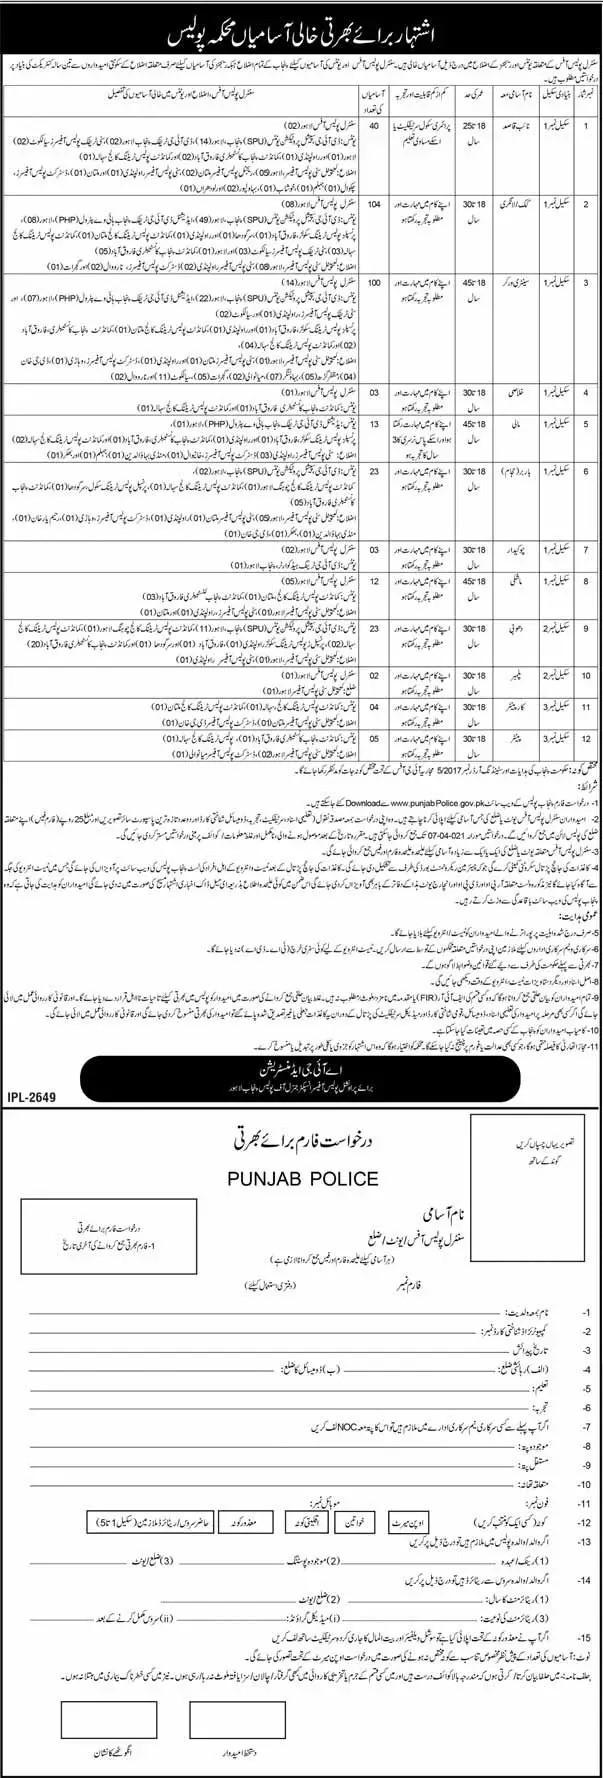 Punjab Police Jobs 2021 Application Form Download - Latest Punjab Police Jobs 2021 - Punjab Police New Jobs 2021 - Police Jobs 2021 Punjab - Punjab Police Jobs 2021 Latest - How to Apply for Punjab Police Jobs 2021